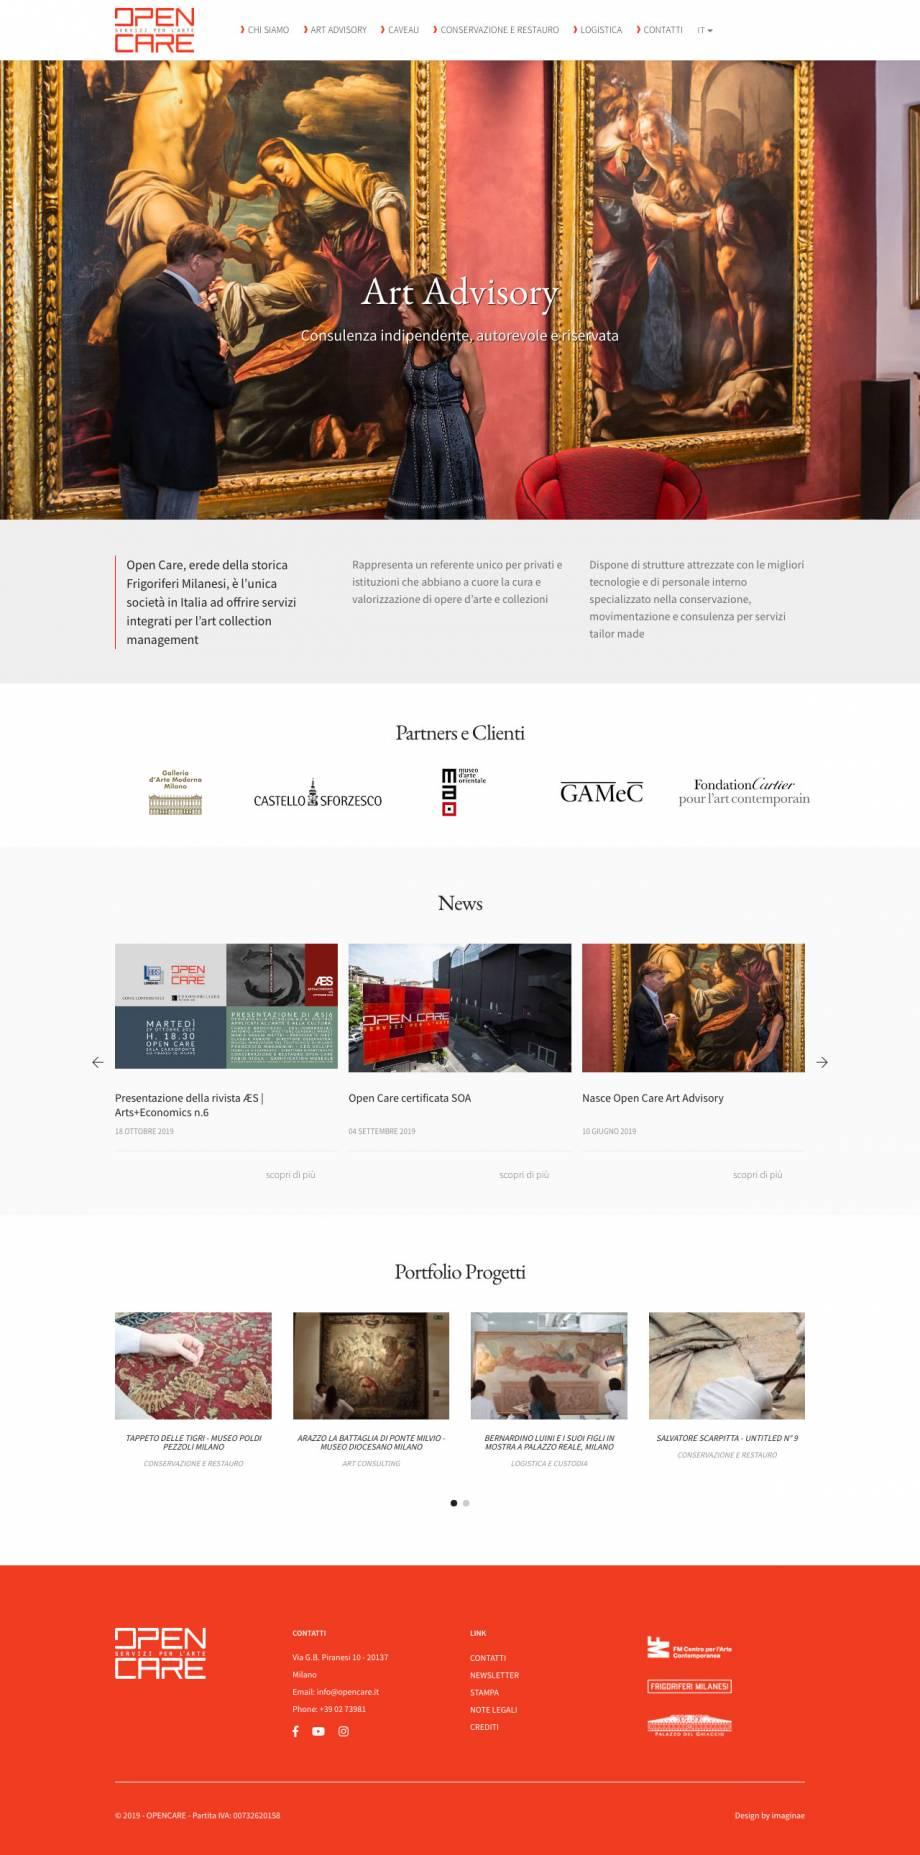 Web Design, Responsive Smartphone & Tablet, Information Architecture,